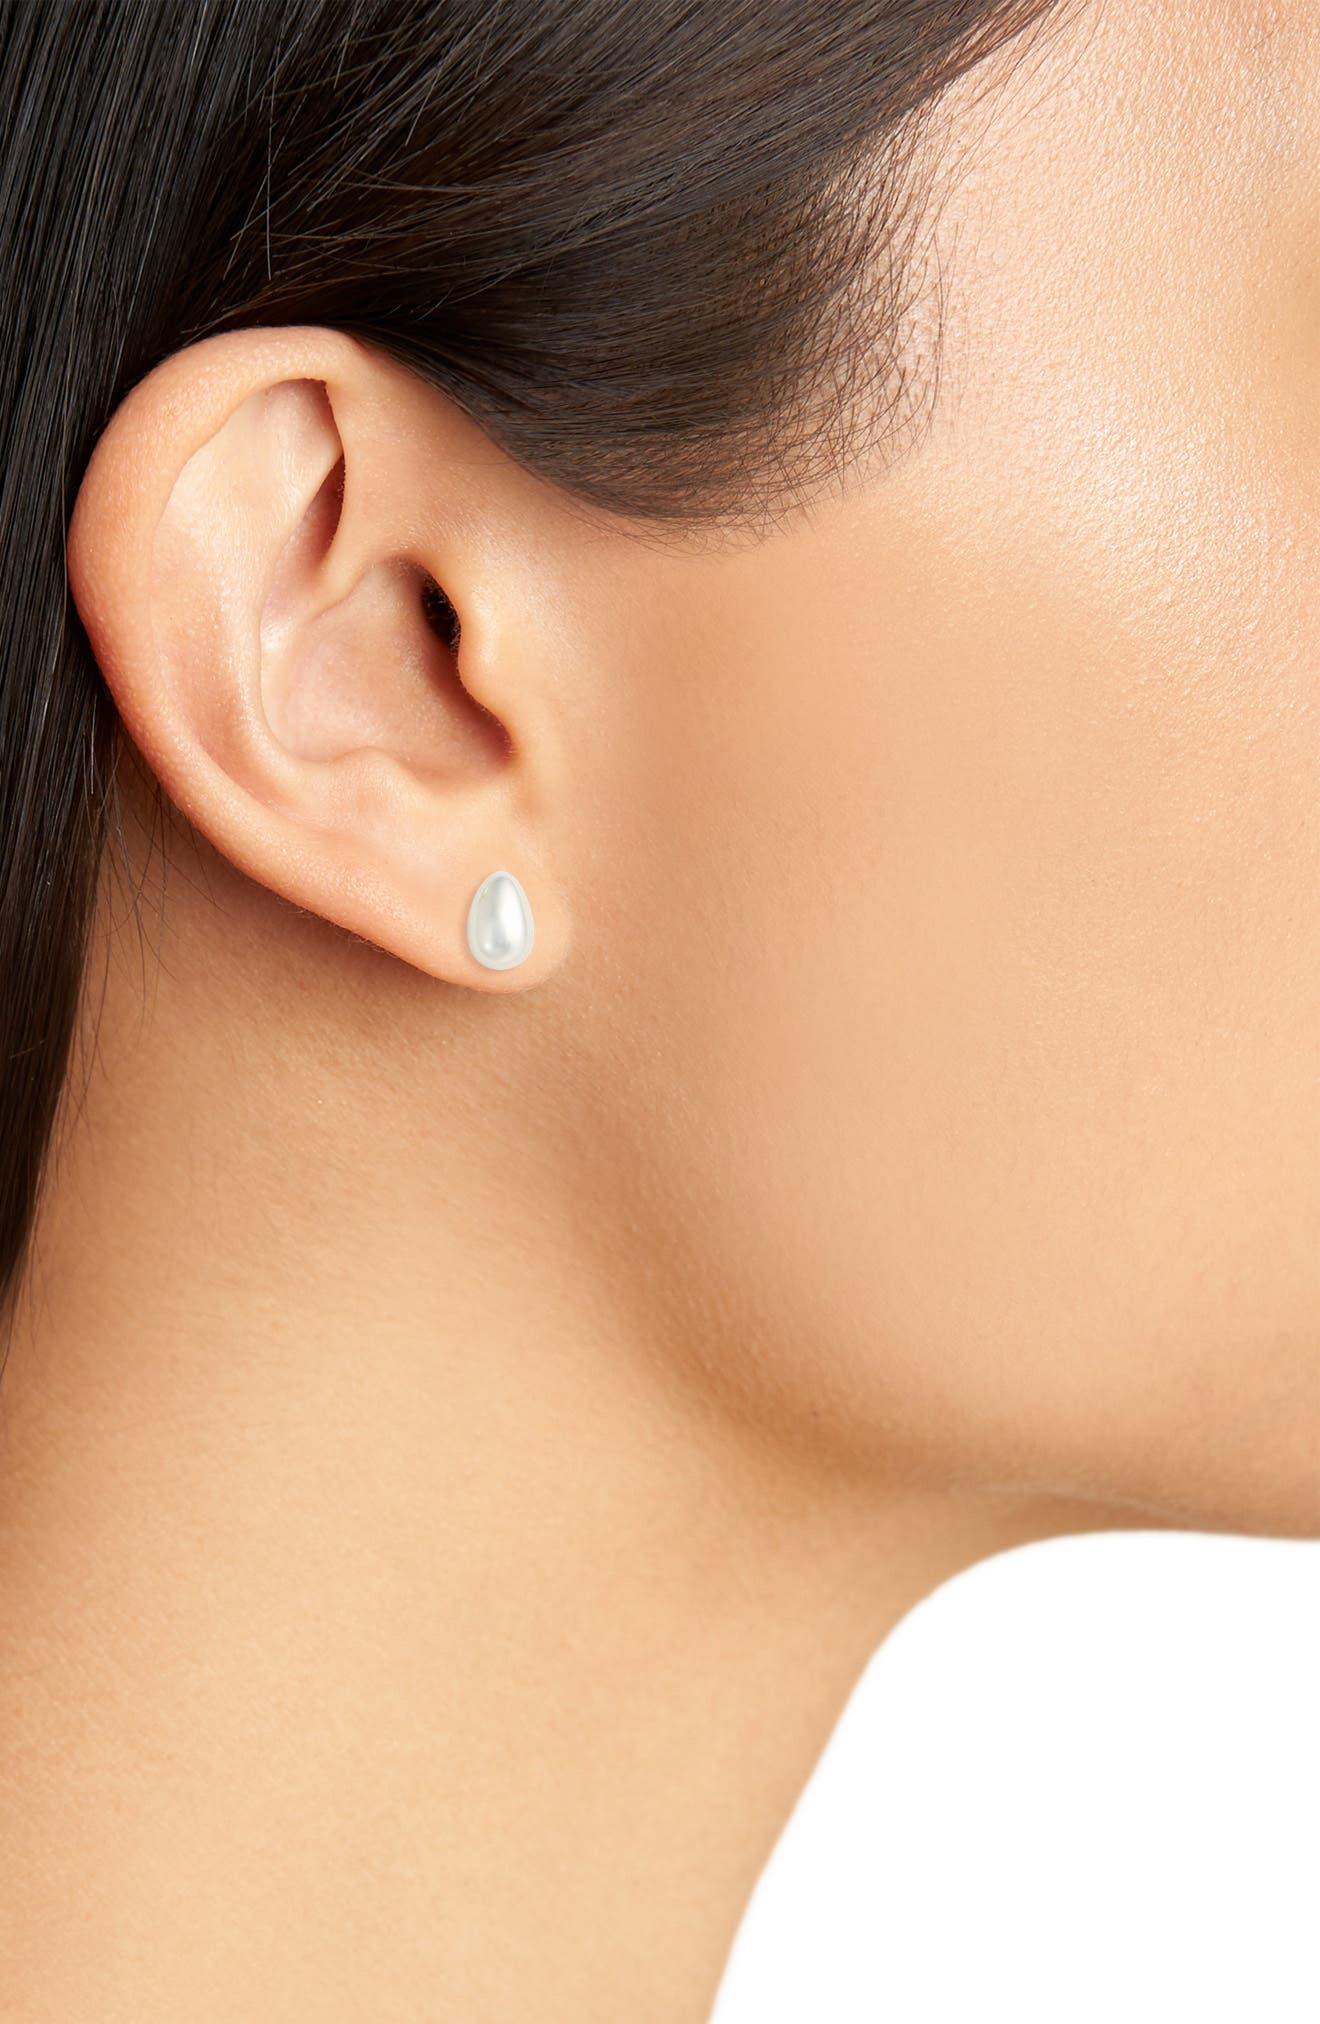 Tiny Egg Stud Earrings,                             Alternate thumbnail 2, color,                             040